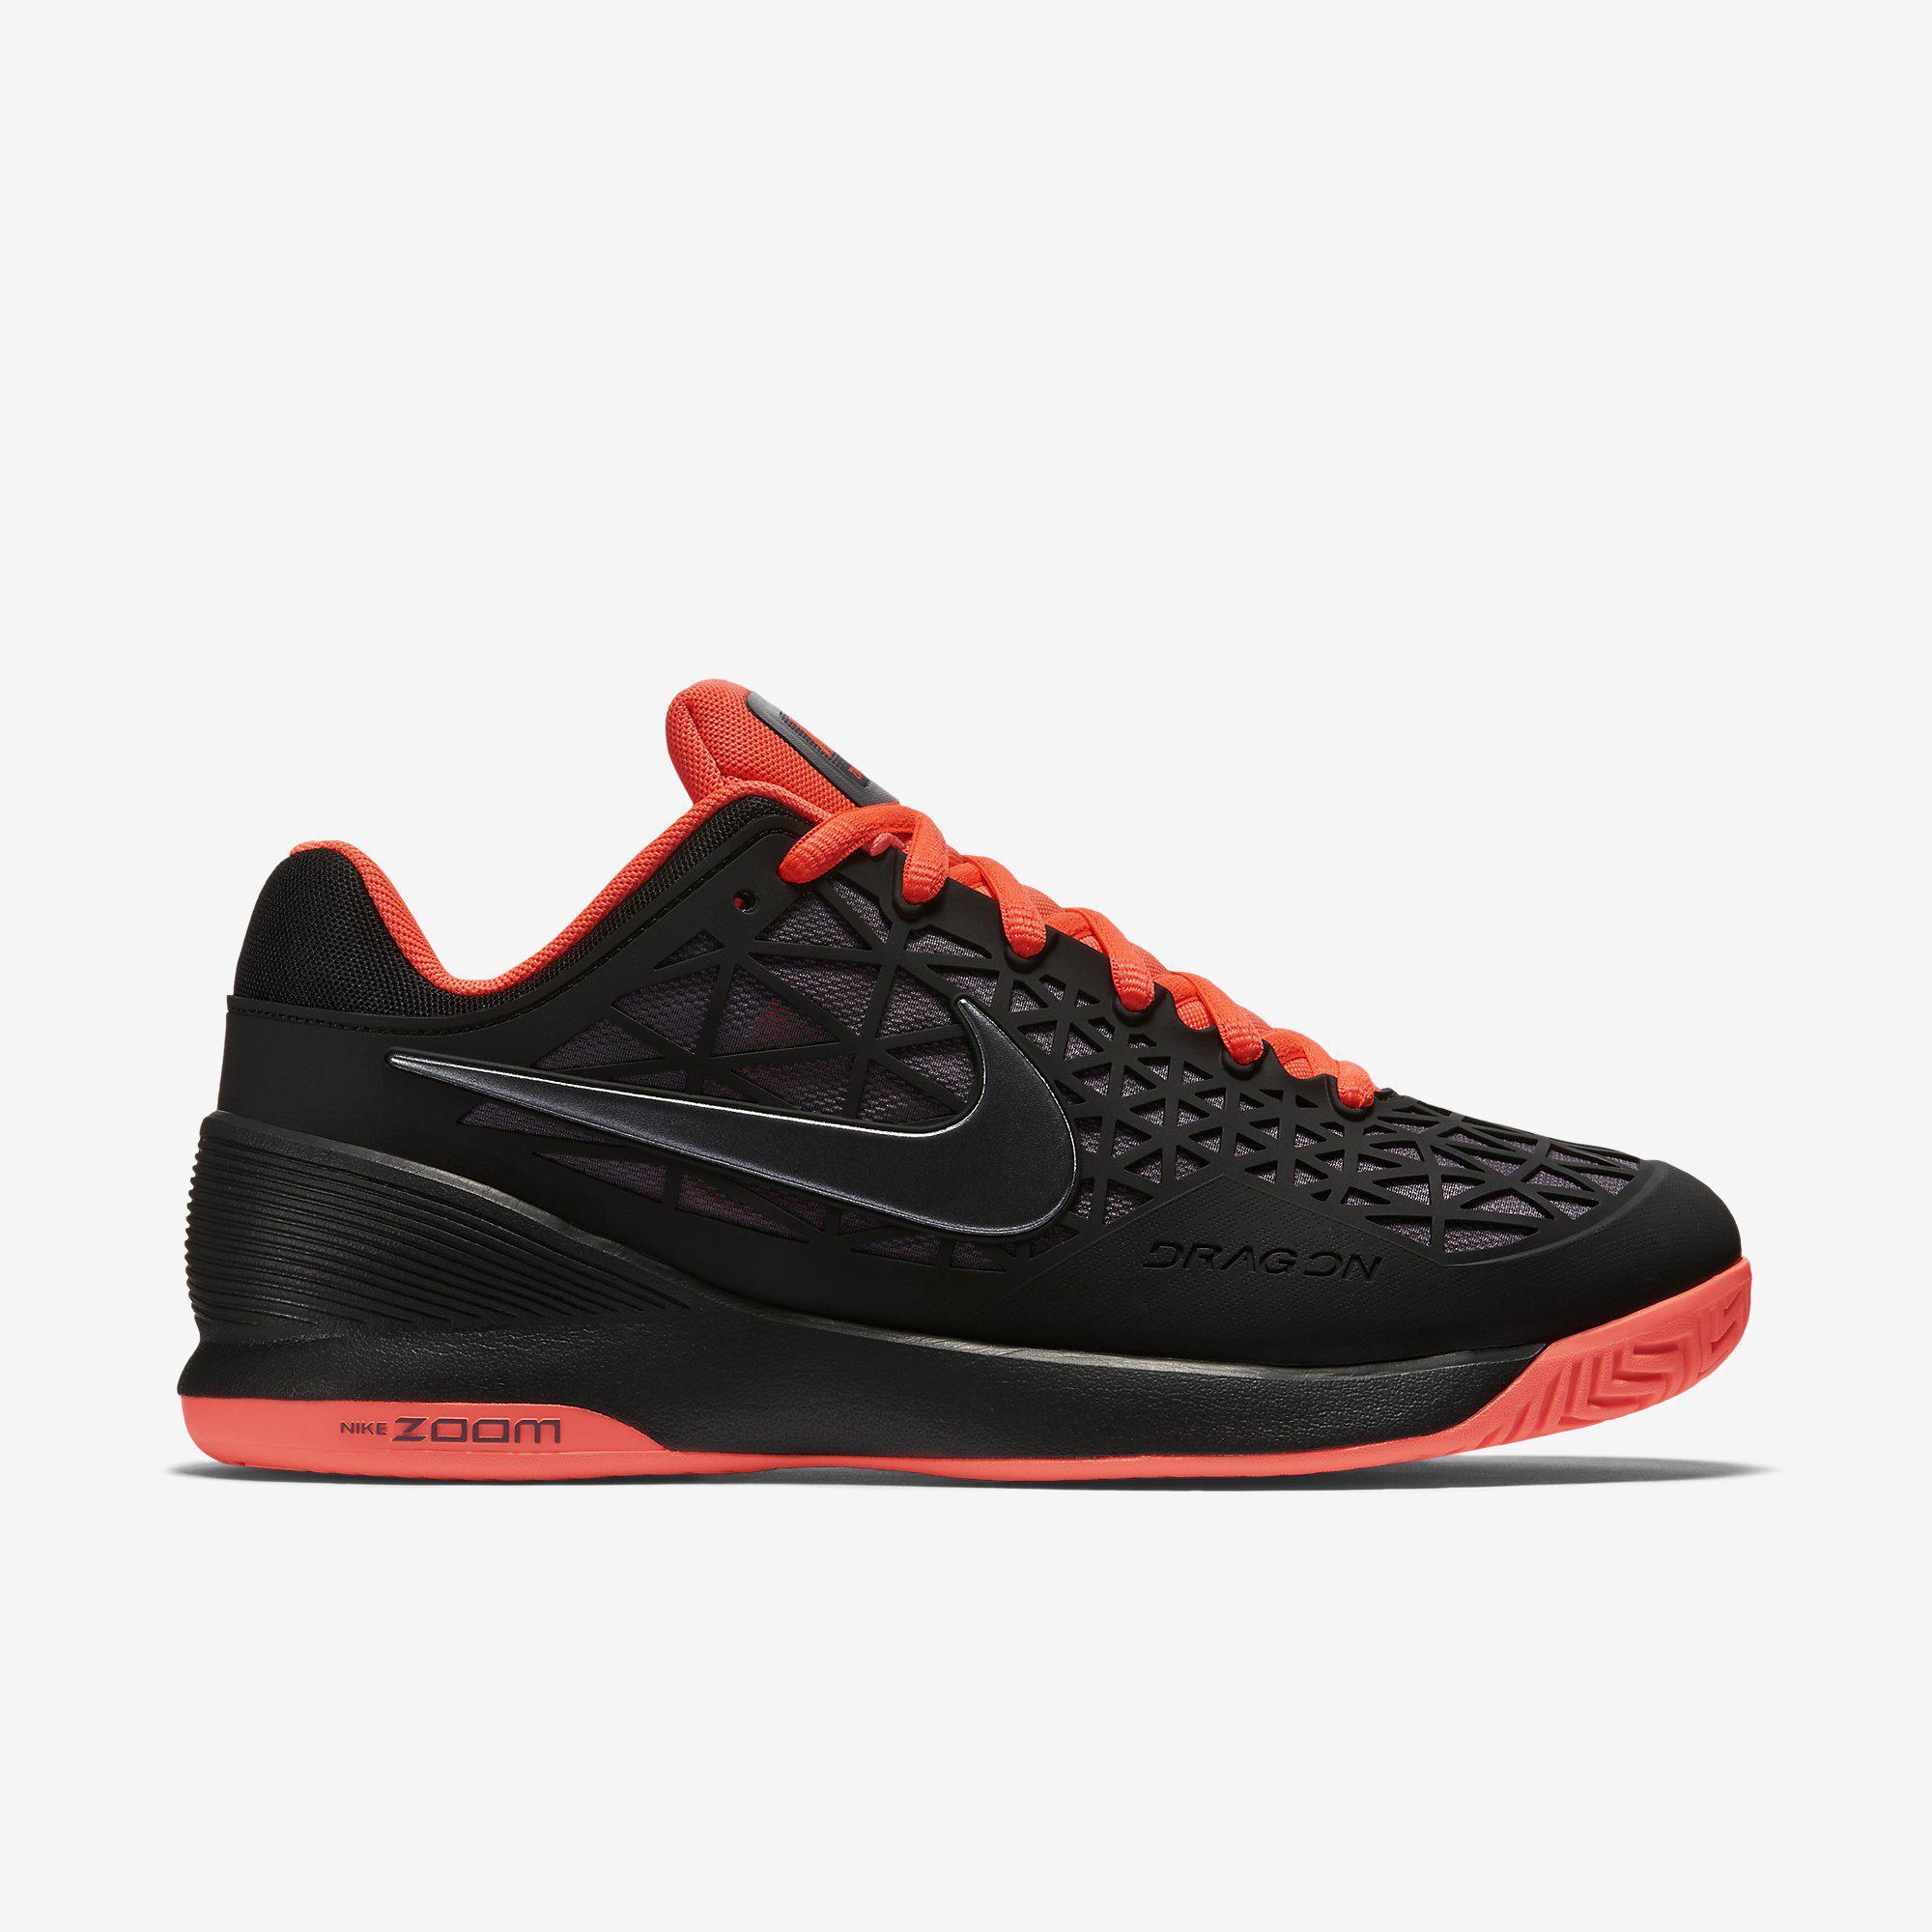 Nike Kids Zoom Cage 2 Tennis Shoes Black Hot Lava